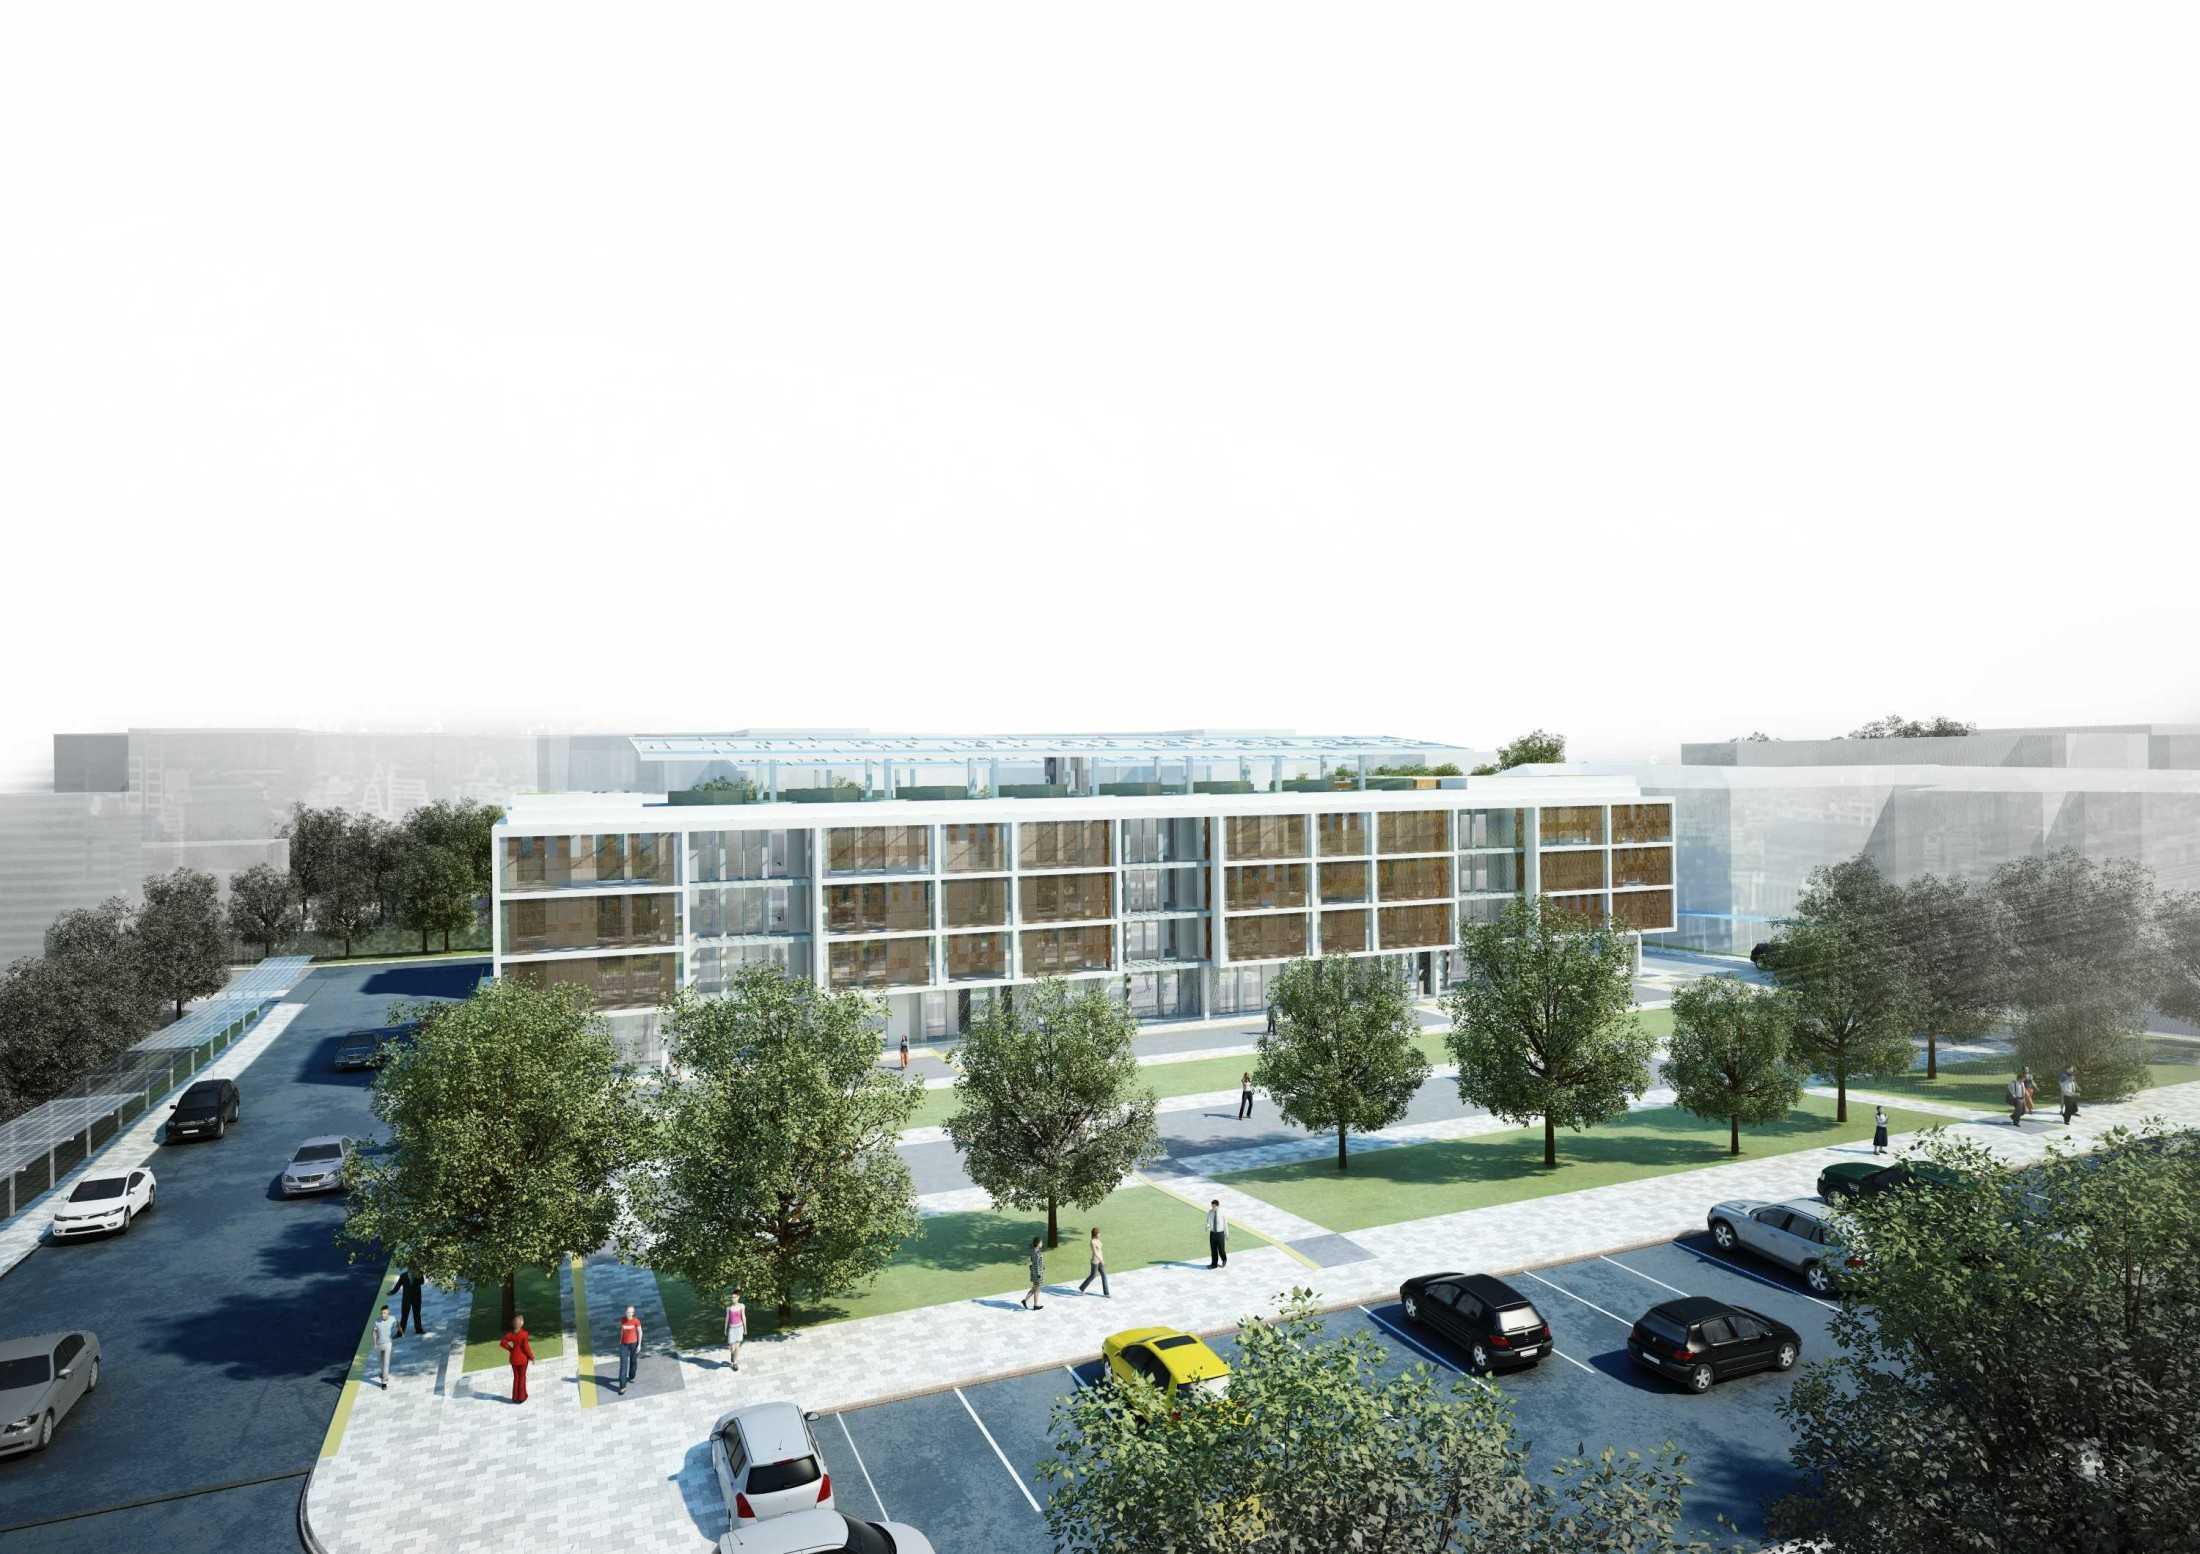 D4 C9 Housing Complex - Madrid Madrid, Spanyol Madrid, Spanyol D4-C9-Housing-Complex-Madrid  102349